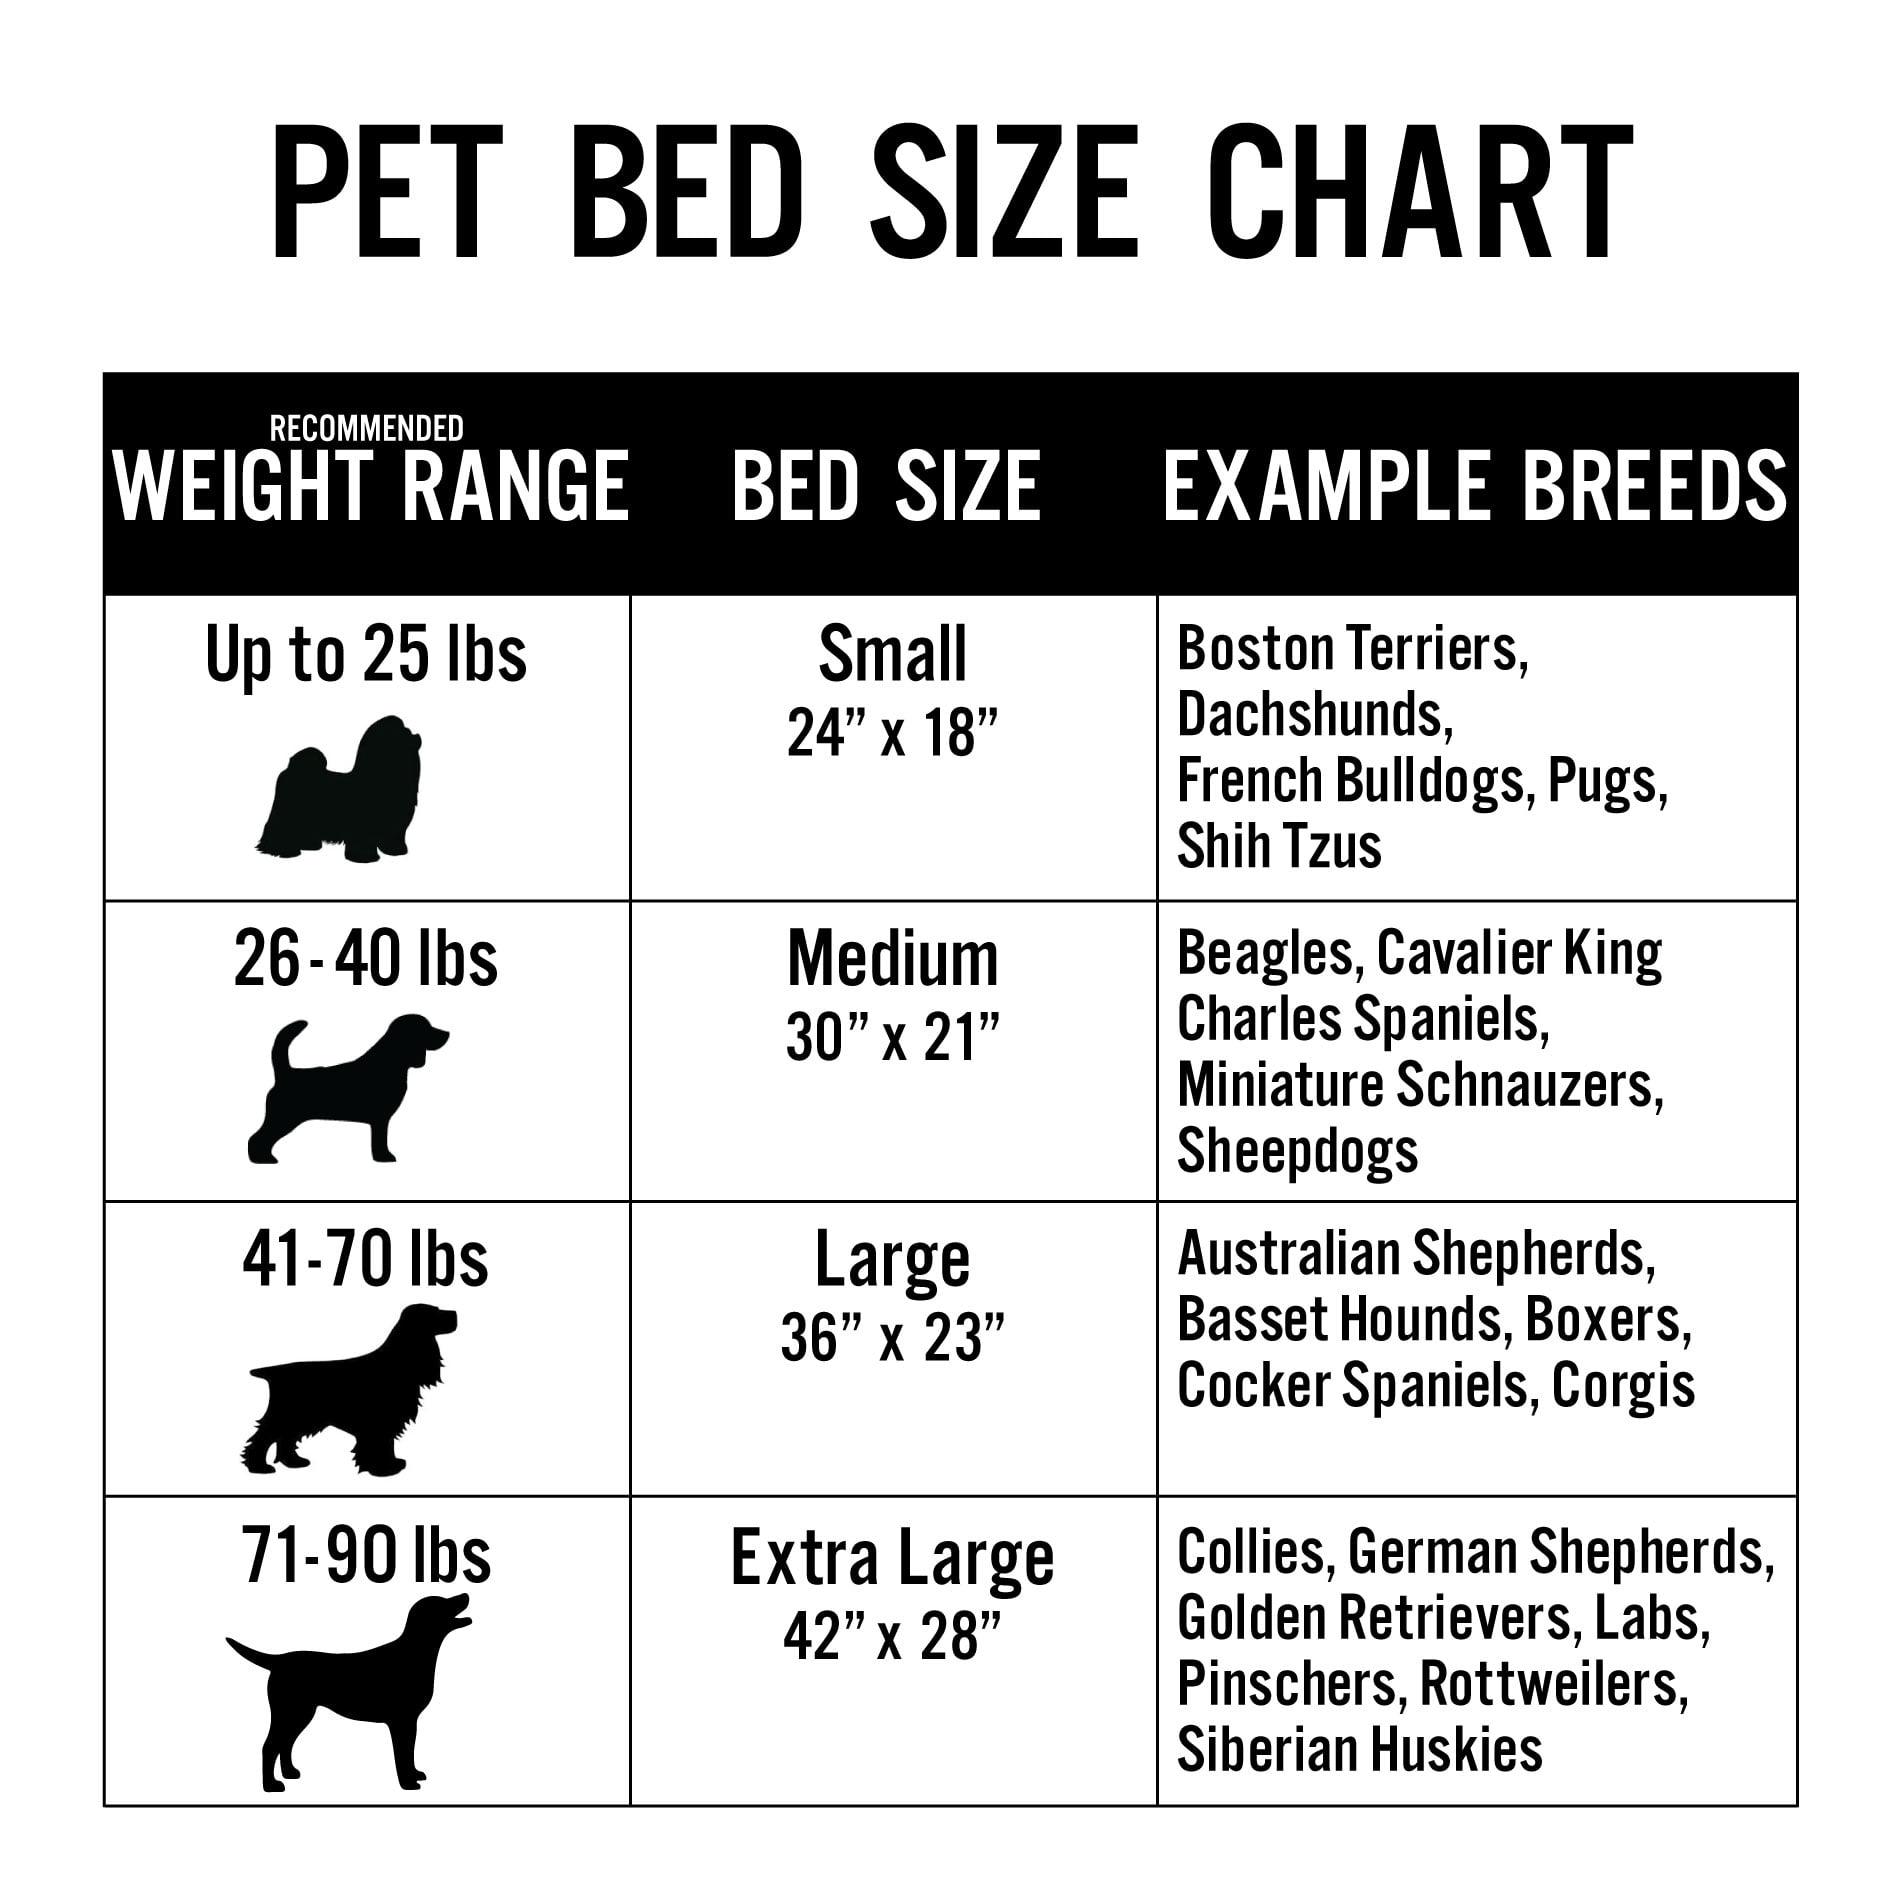 Dog crate pad bolster bed pet mat waterproof 42 x 28 extra large dog crate pad bolster bed pet mat waterproof 42 x 28 extra large brown and blue bone walmart nvjuhfo Choice Image